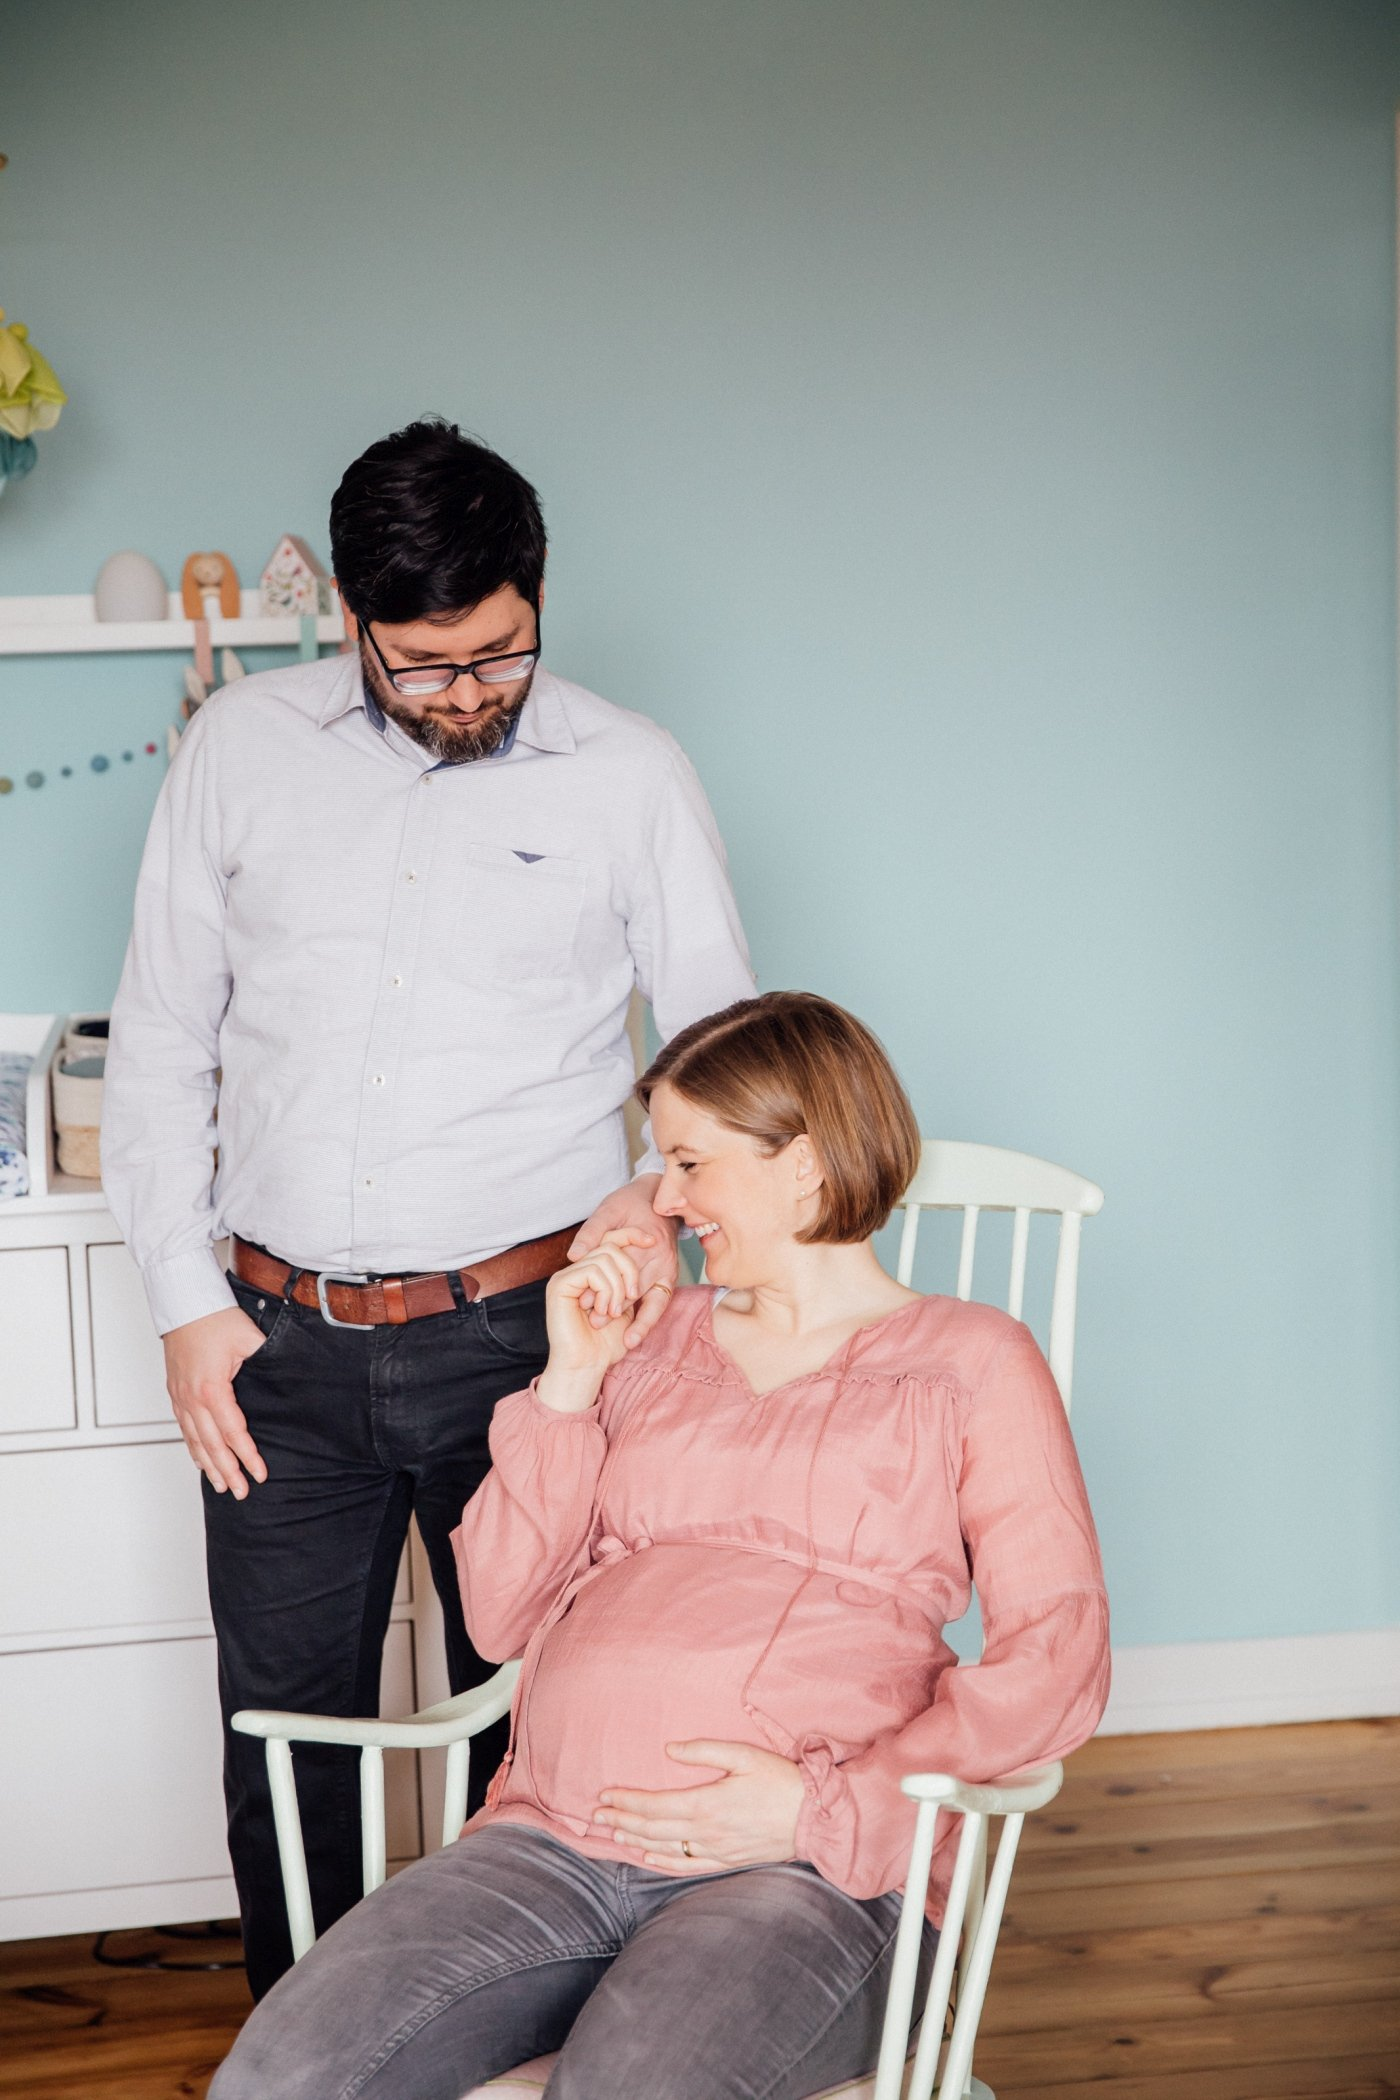 Babybauchfotos-Schwangerschaft-Paarfotos-Homeshooting-Pfalz-Landau-Karlsruhe